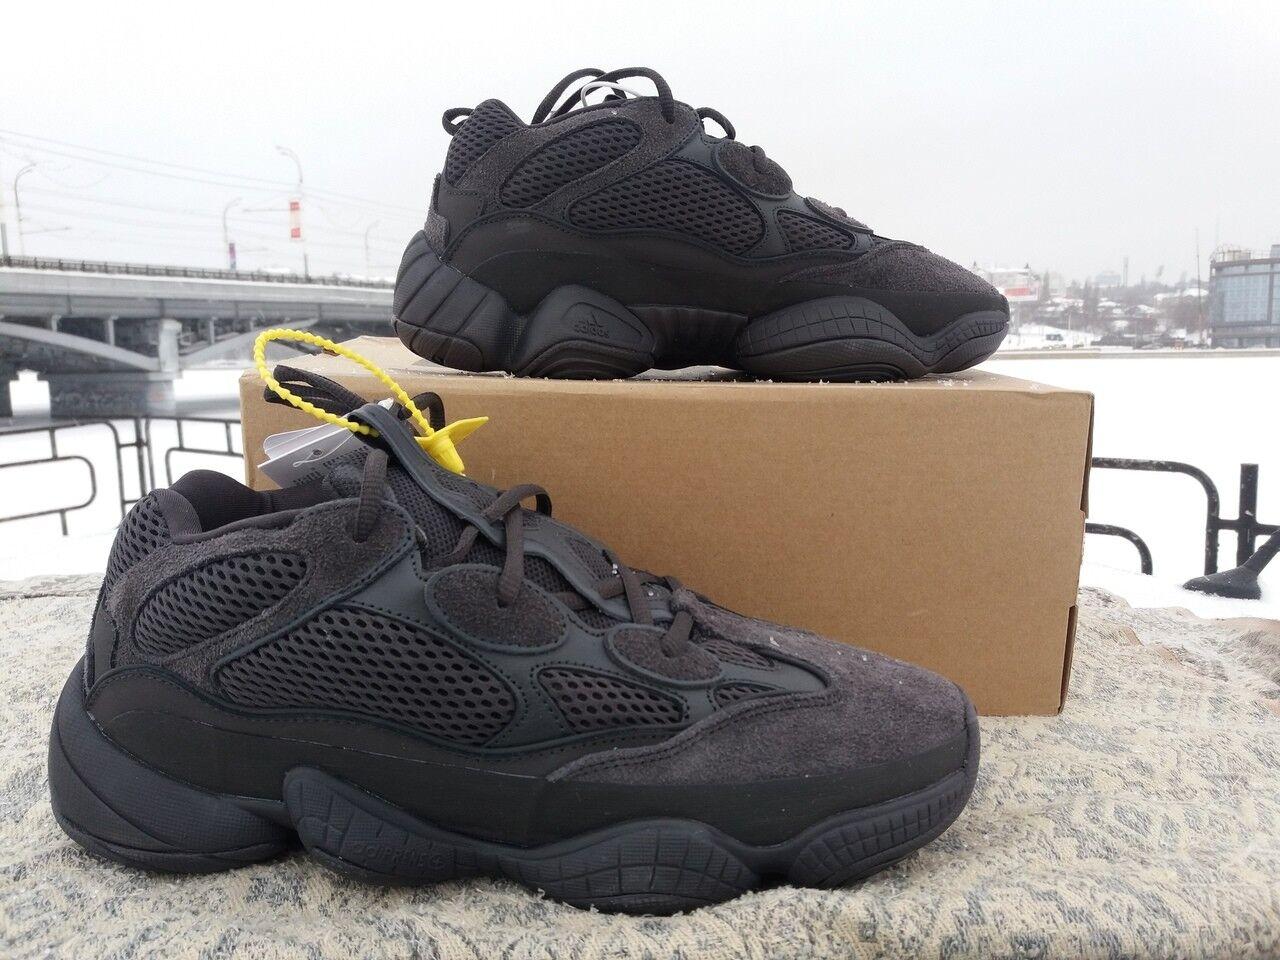 Adidas Yeezy Boost 500 черный F36640 9.5 U.S.  Big sale